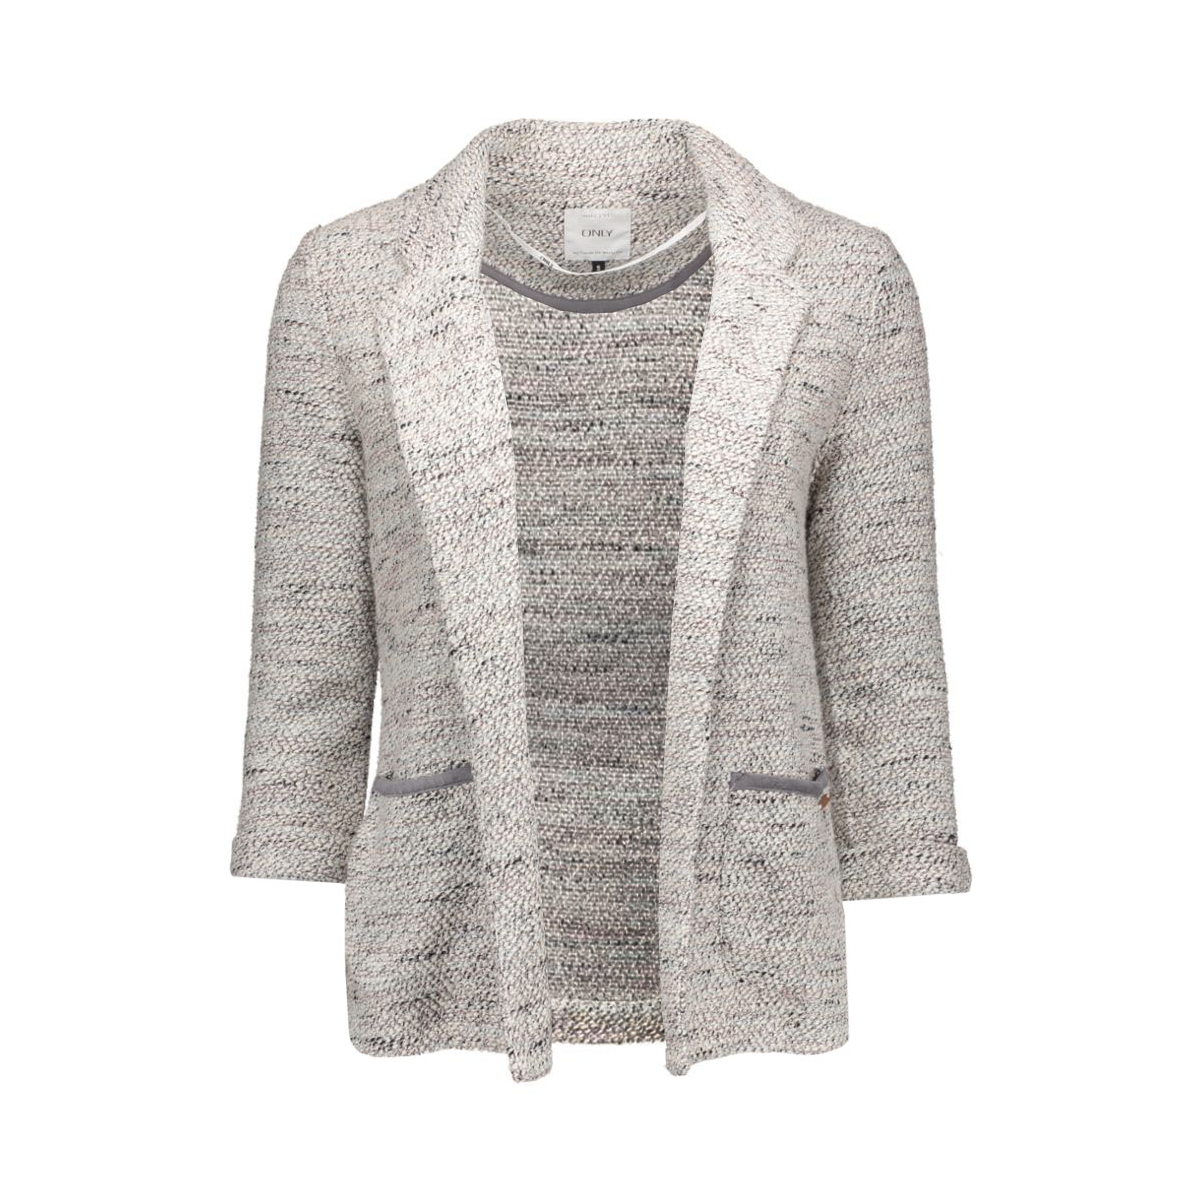 onlnew ada 3/4 jacket jrs 15128610 only blazer cloud dancer